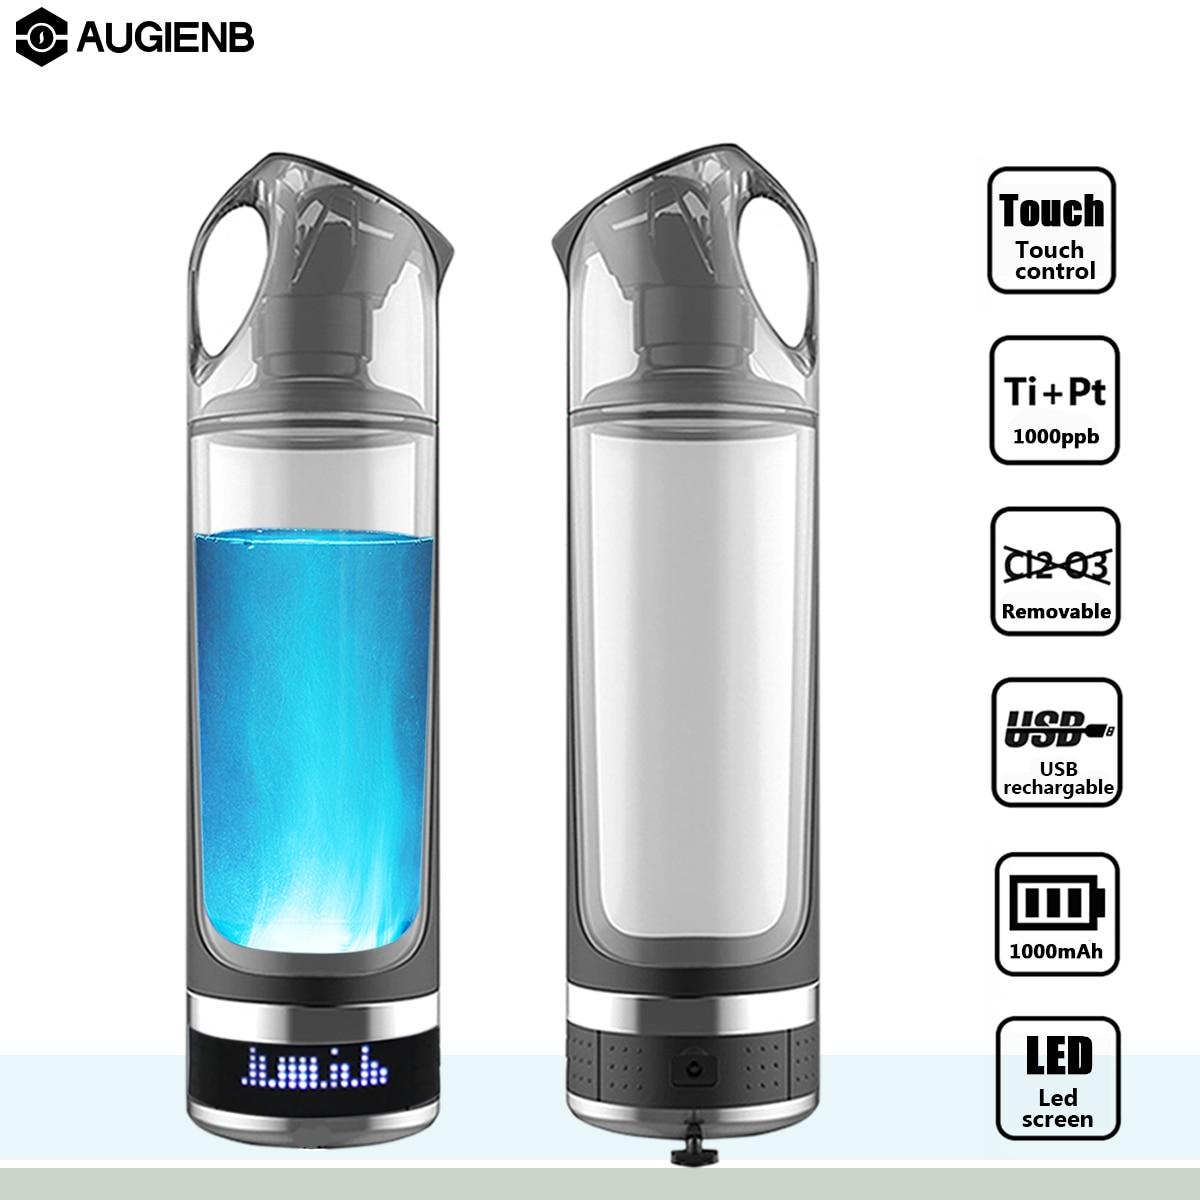 AUGIENB 500ml Hydrogen Rich Water Bottle Lonizer Alkaline Generator LED Portable Healthy Cup USB Rechargeable Anti-Aging